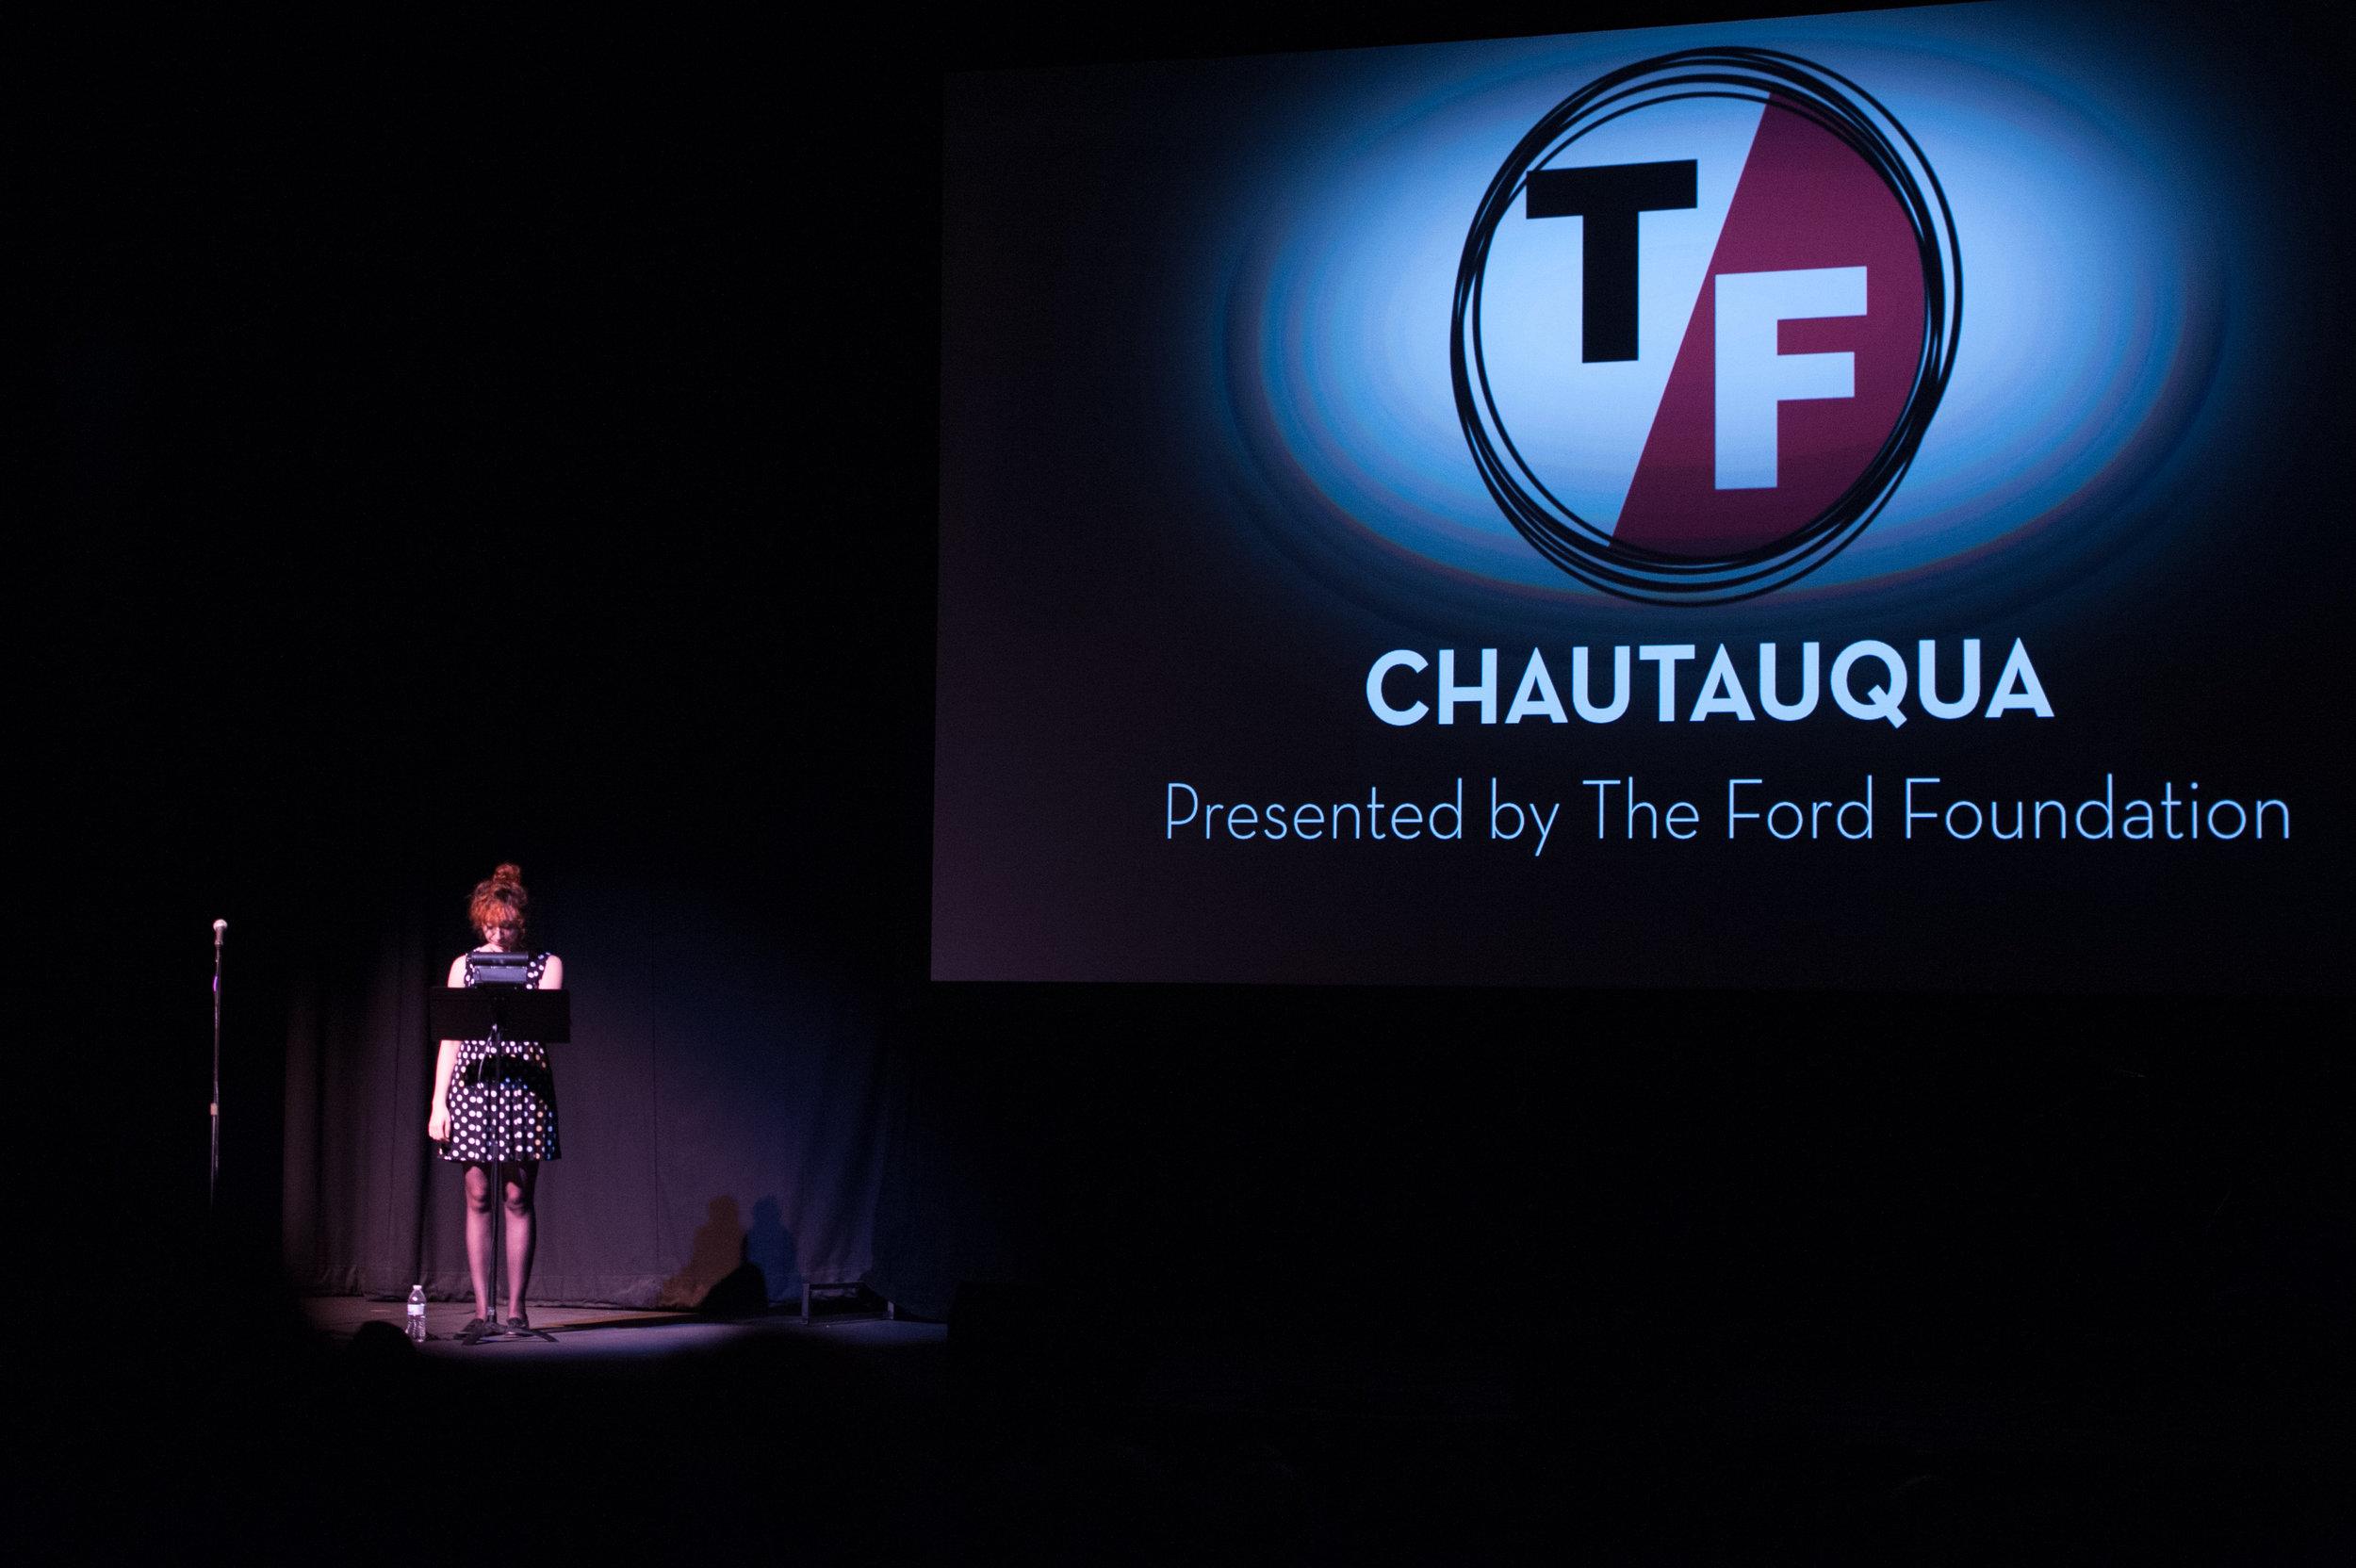 EmCee-ing at the True/False Film Festival. Photo credit: Stephanie Sidoti